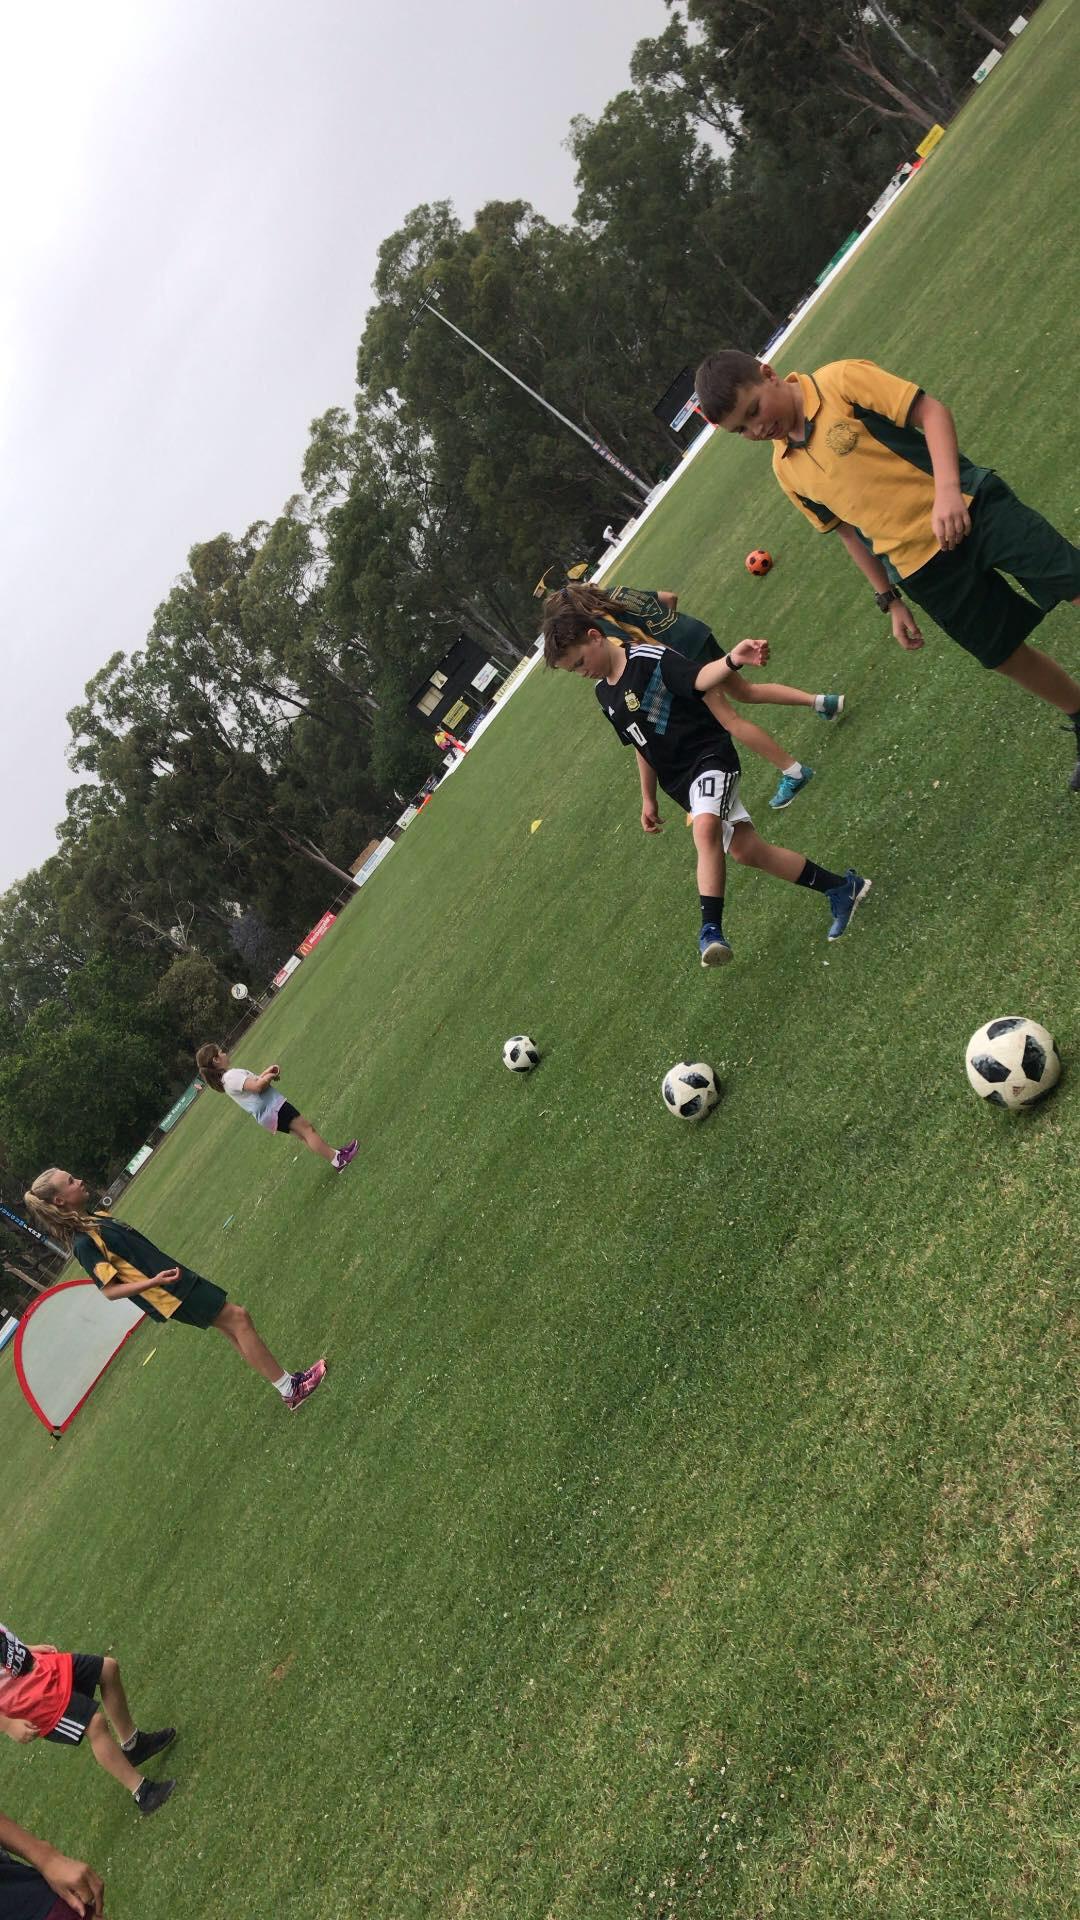 Term 2 Kids Soccer Skills